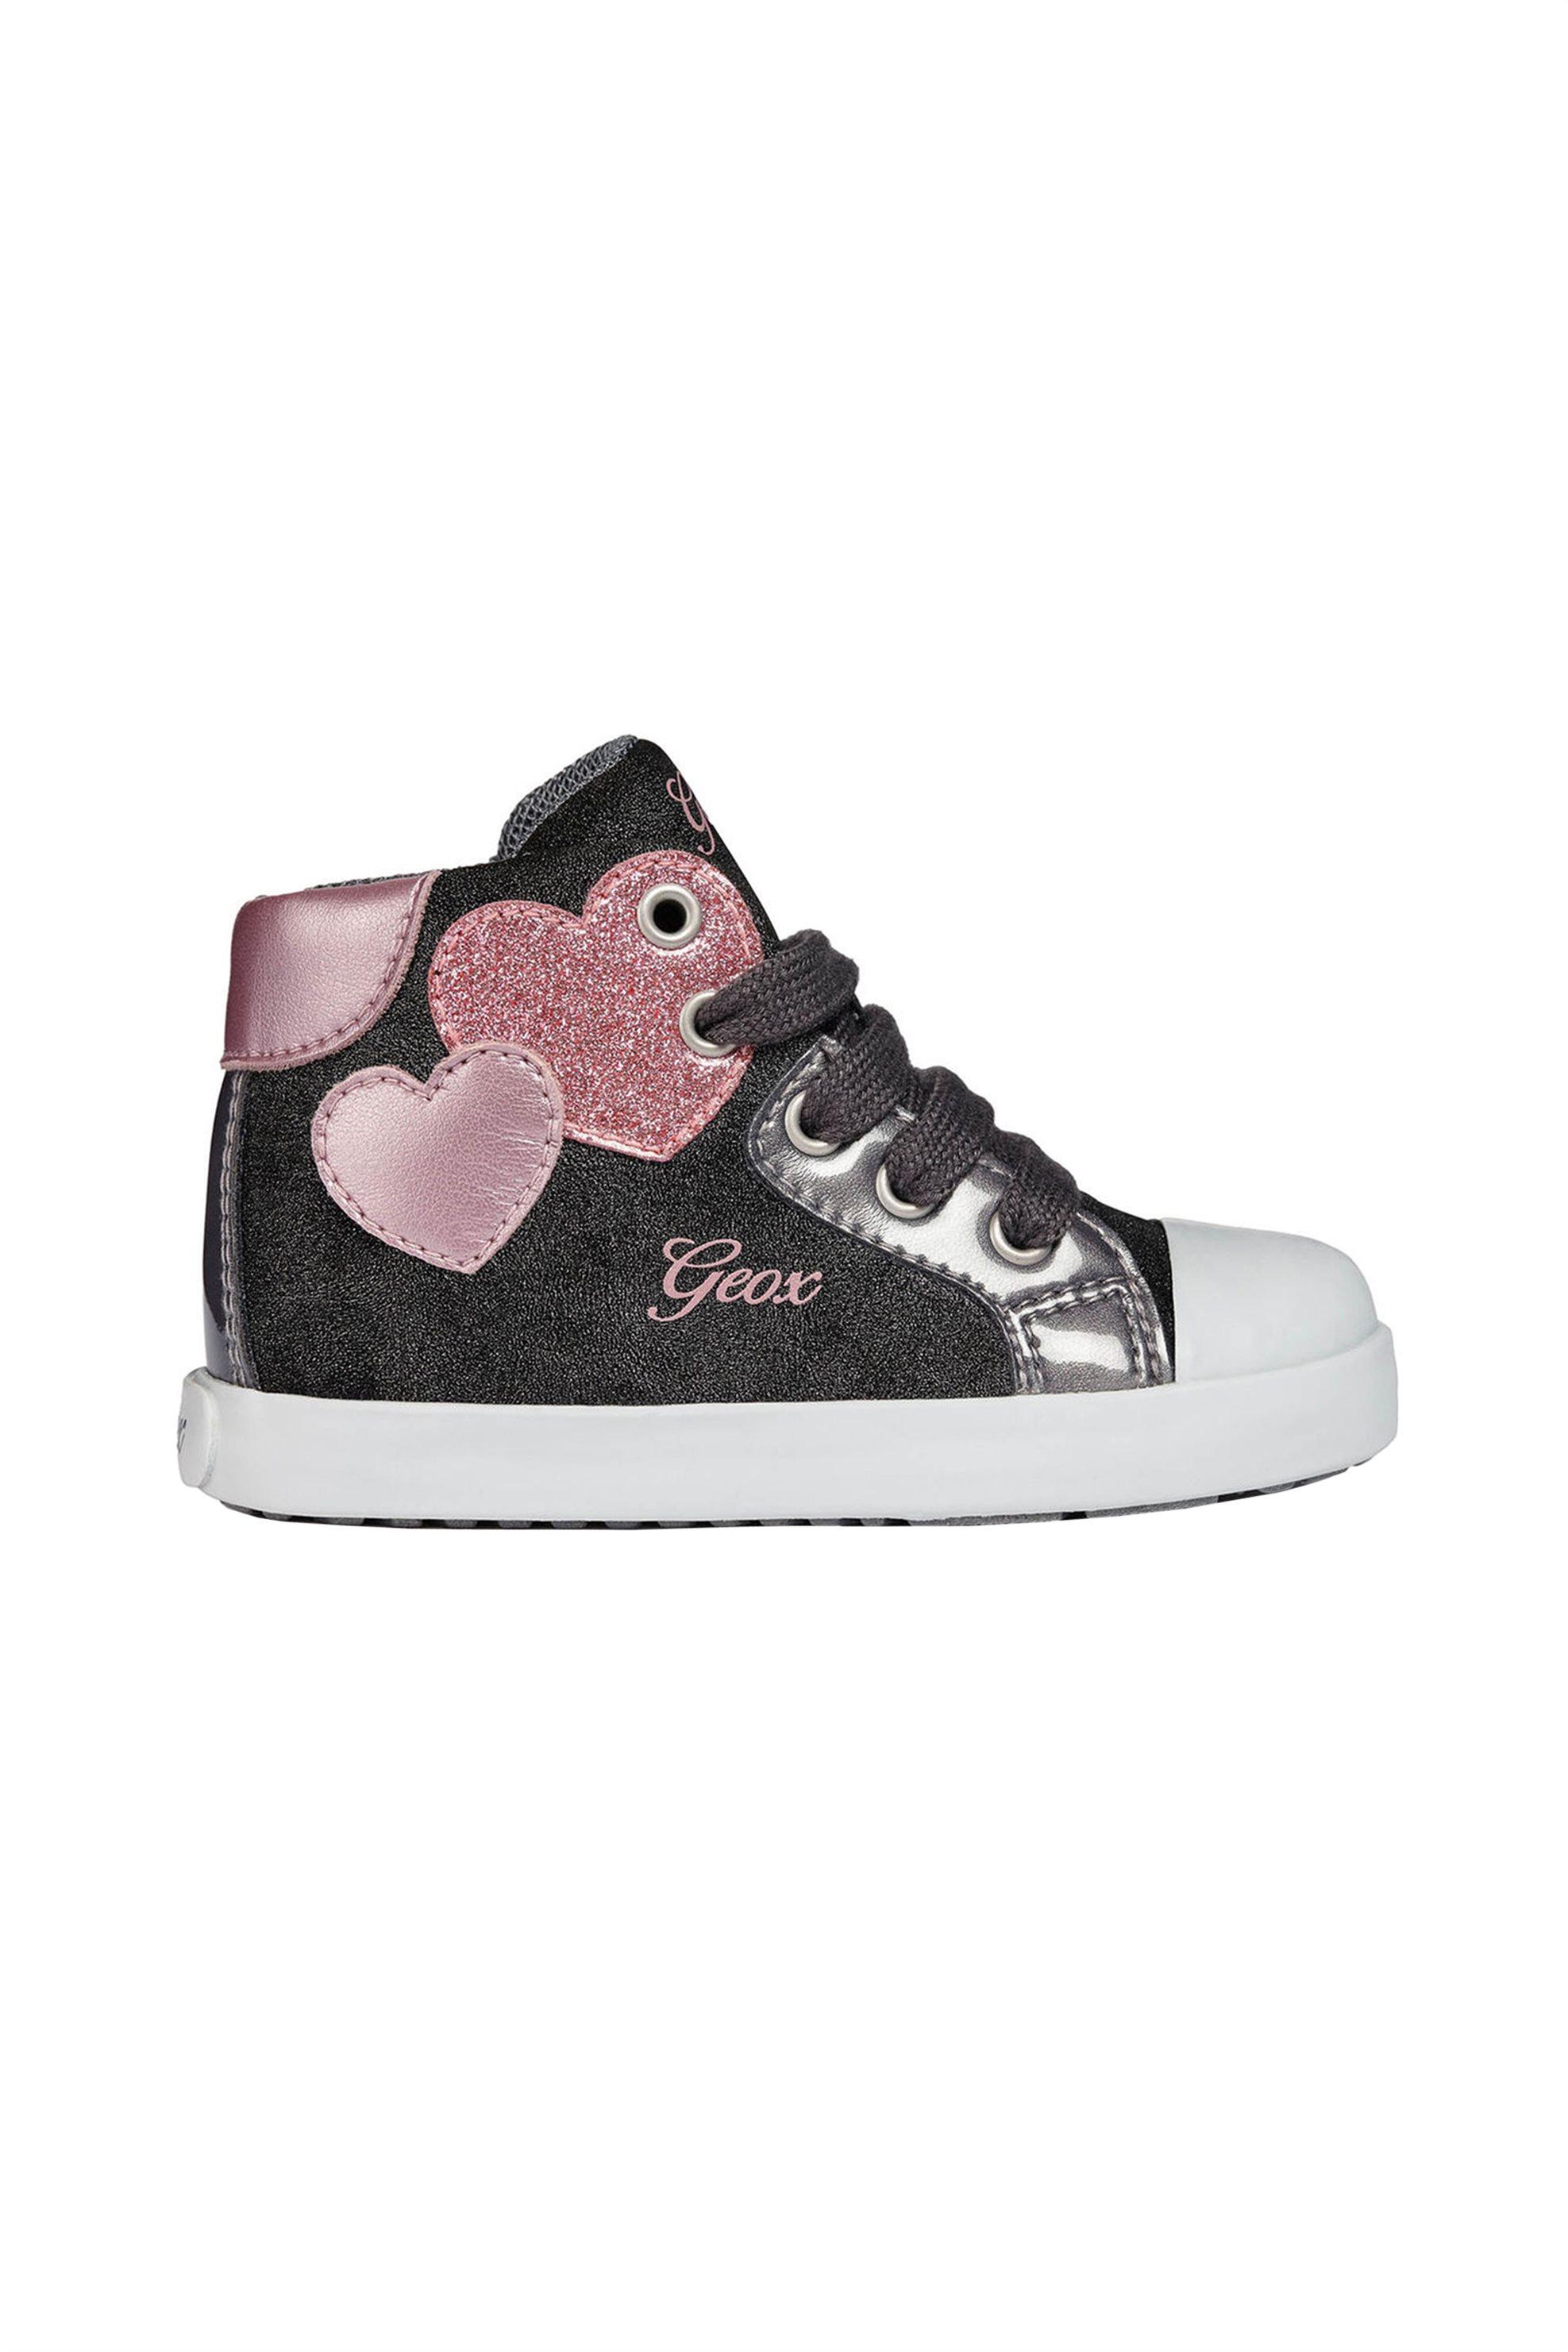 -30% Notos Geox βρεφικά sneakers μποτάκια Baby Kilwi Girl – B84D5C-1 – Μαύρο 3f6c786800c